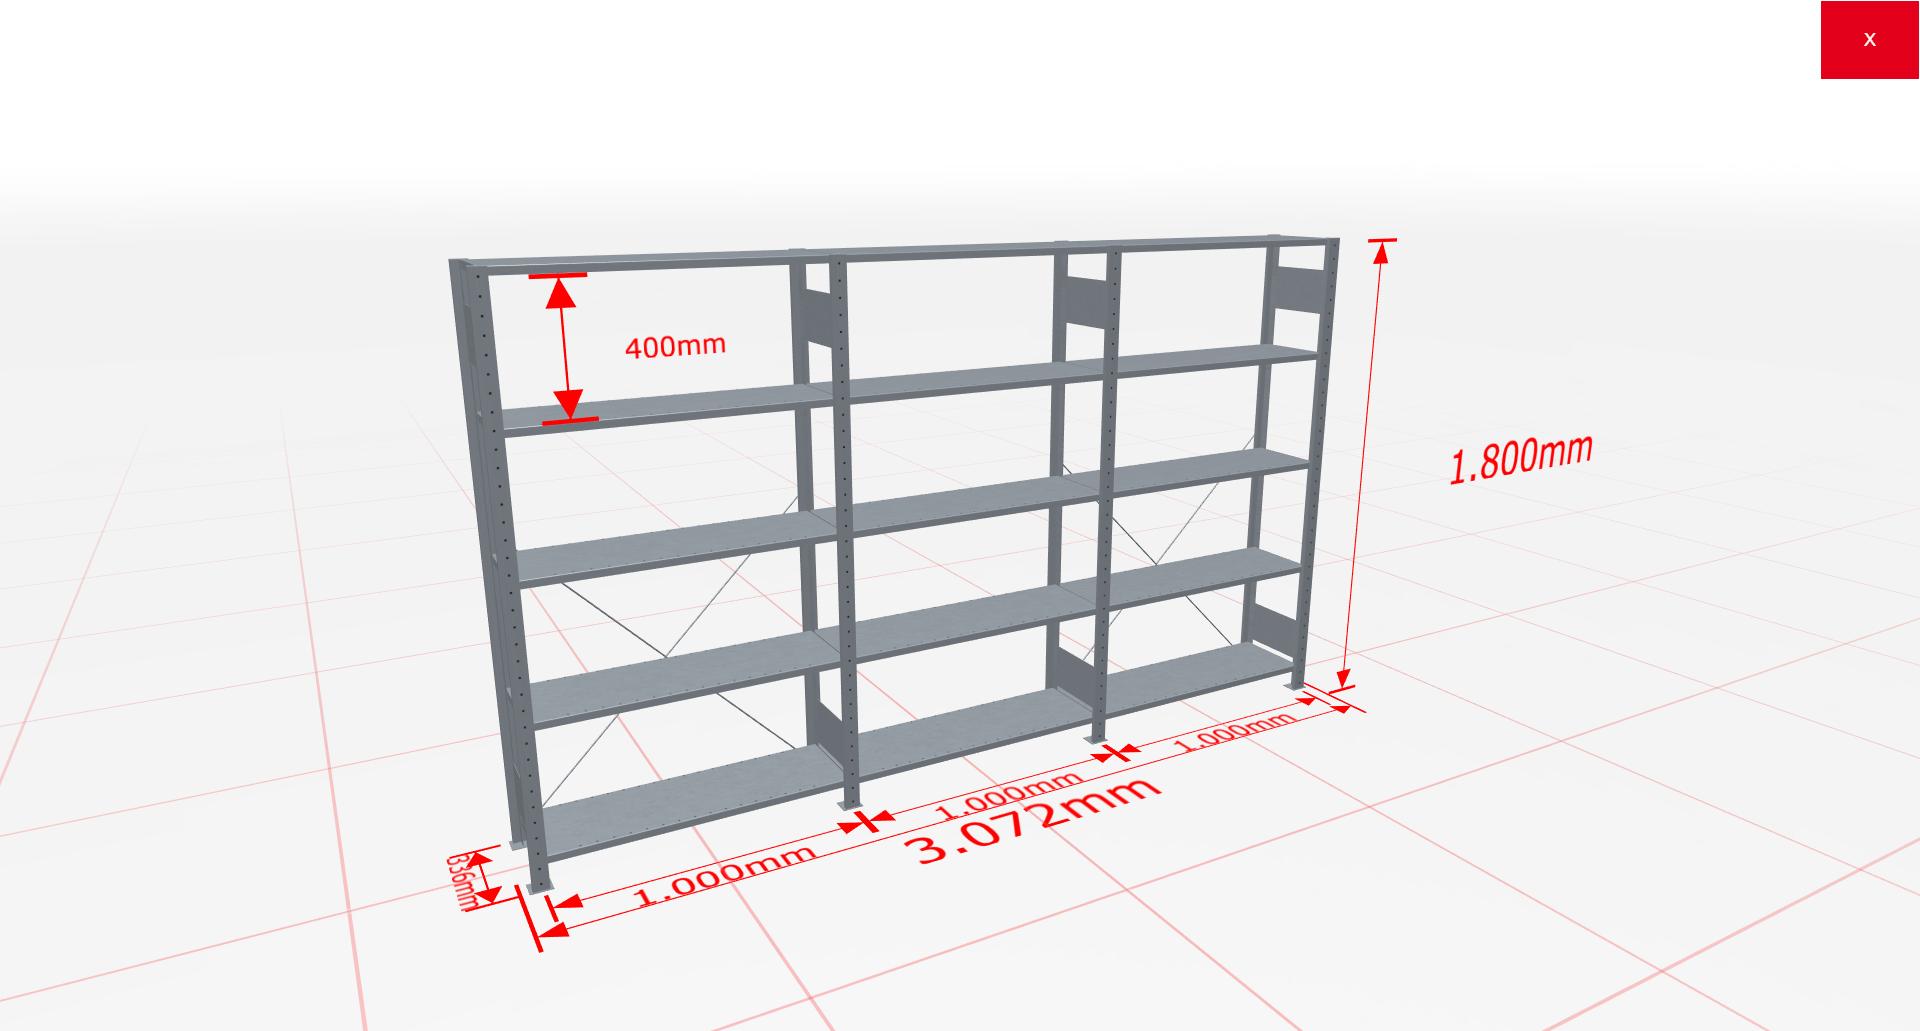 Fachbodenregal Komplettregal 1800x4078x300 mm (HxBxT) SCHULTE Lagertechnik verzinkt 5 Ebenen  150 kg je Boden